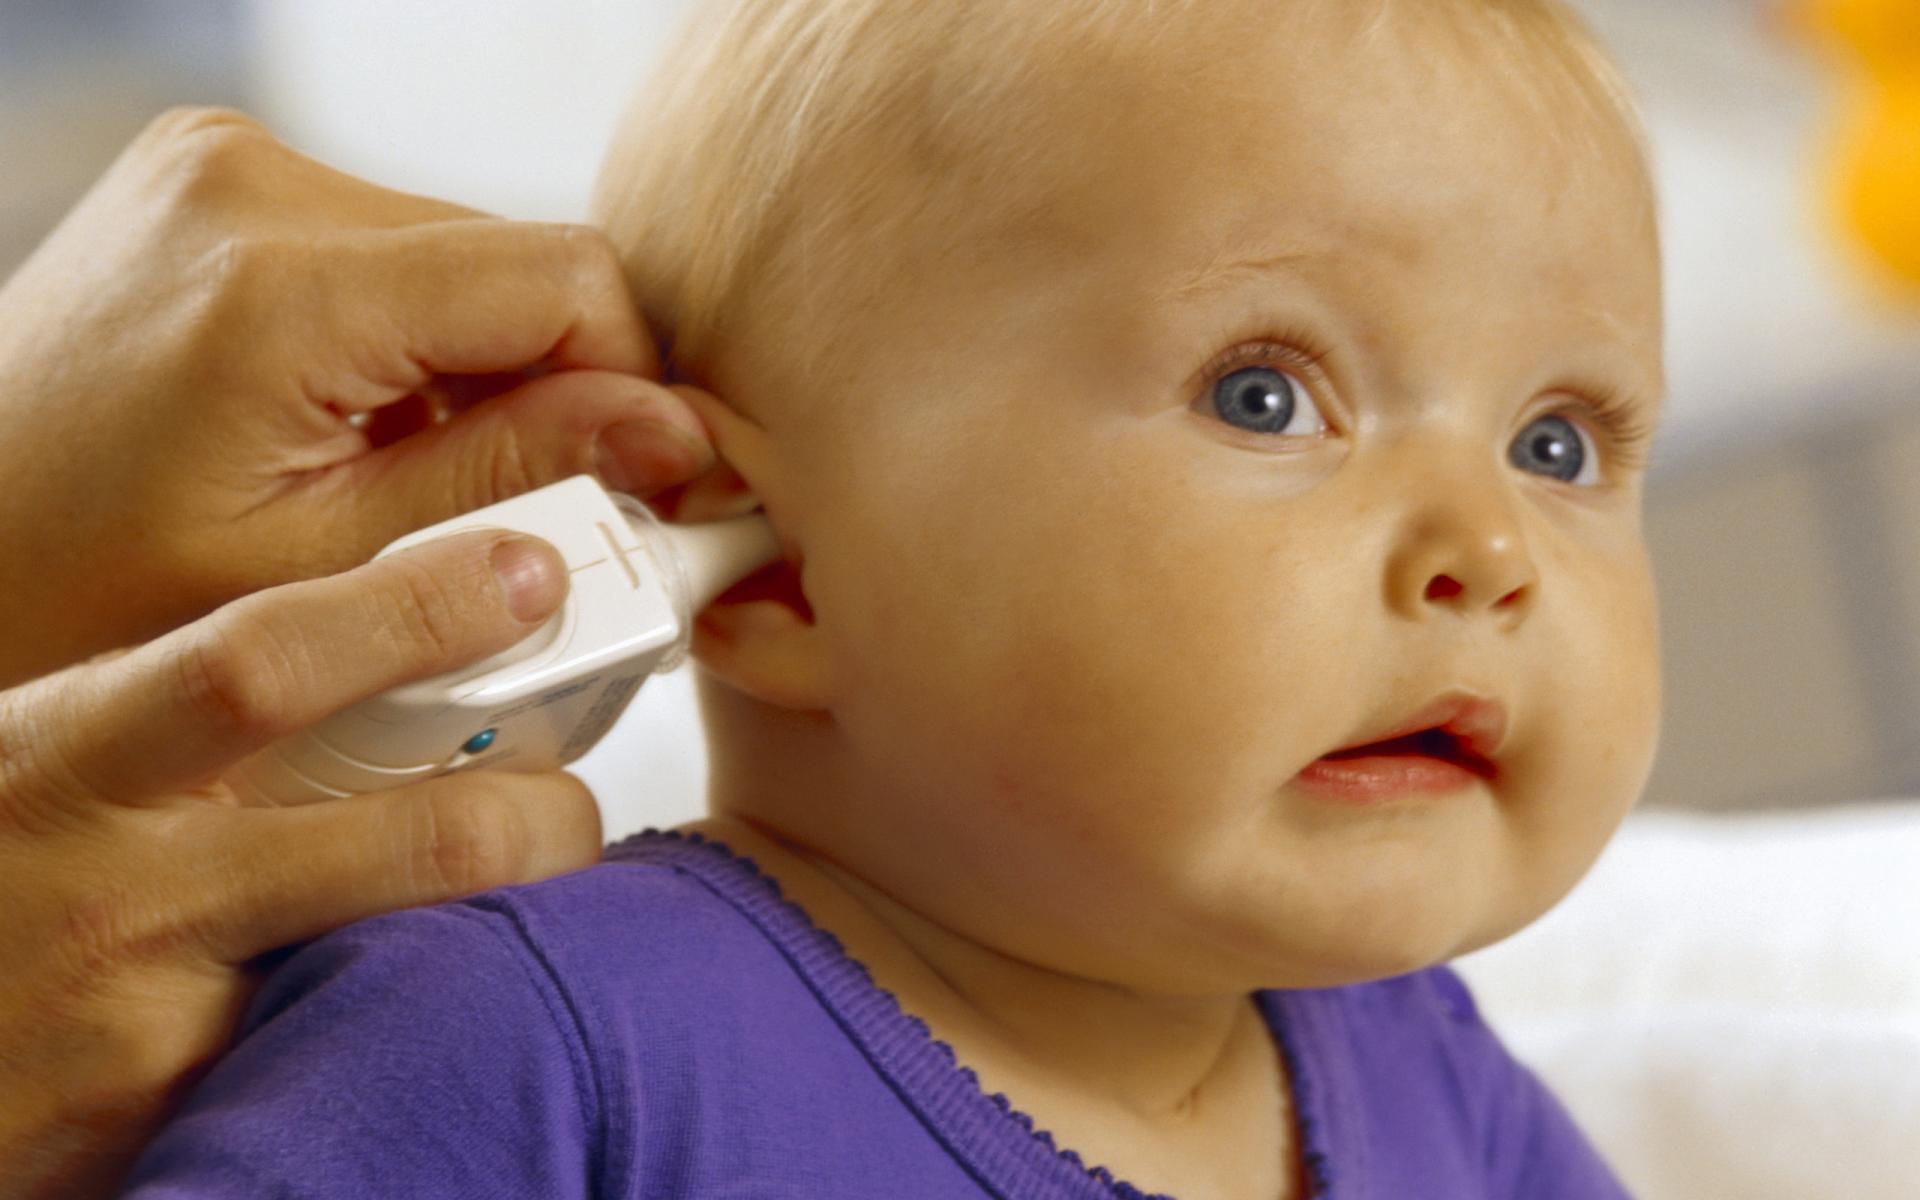 обезболивающее для ребенка при боли в ухе